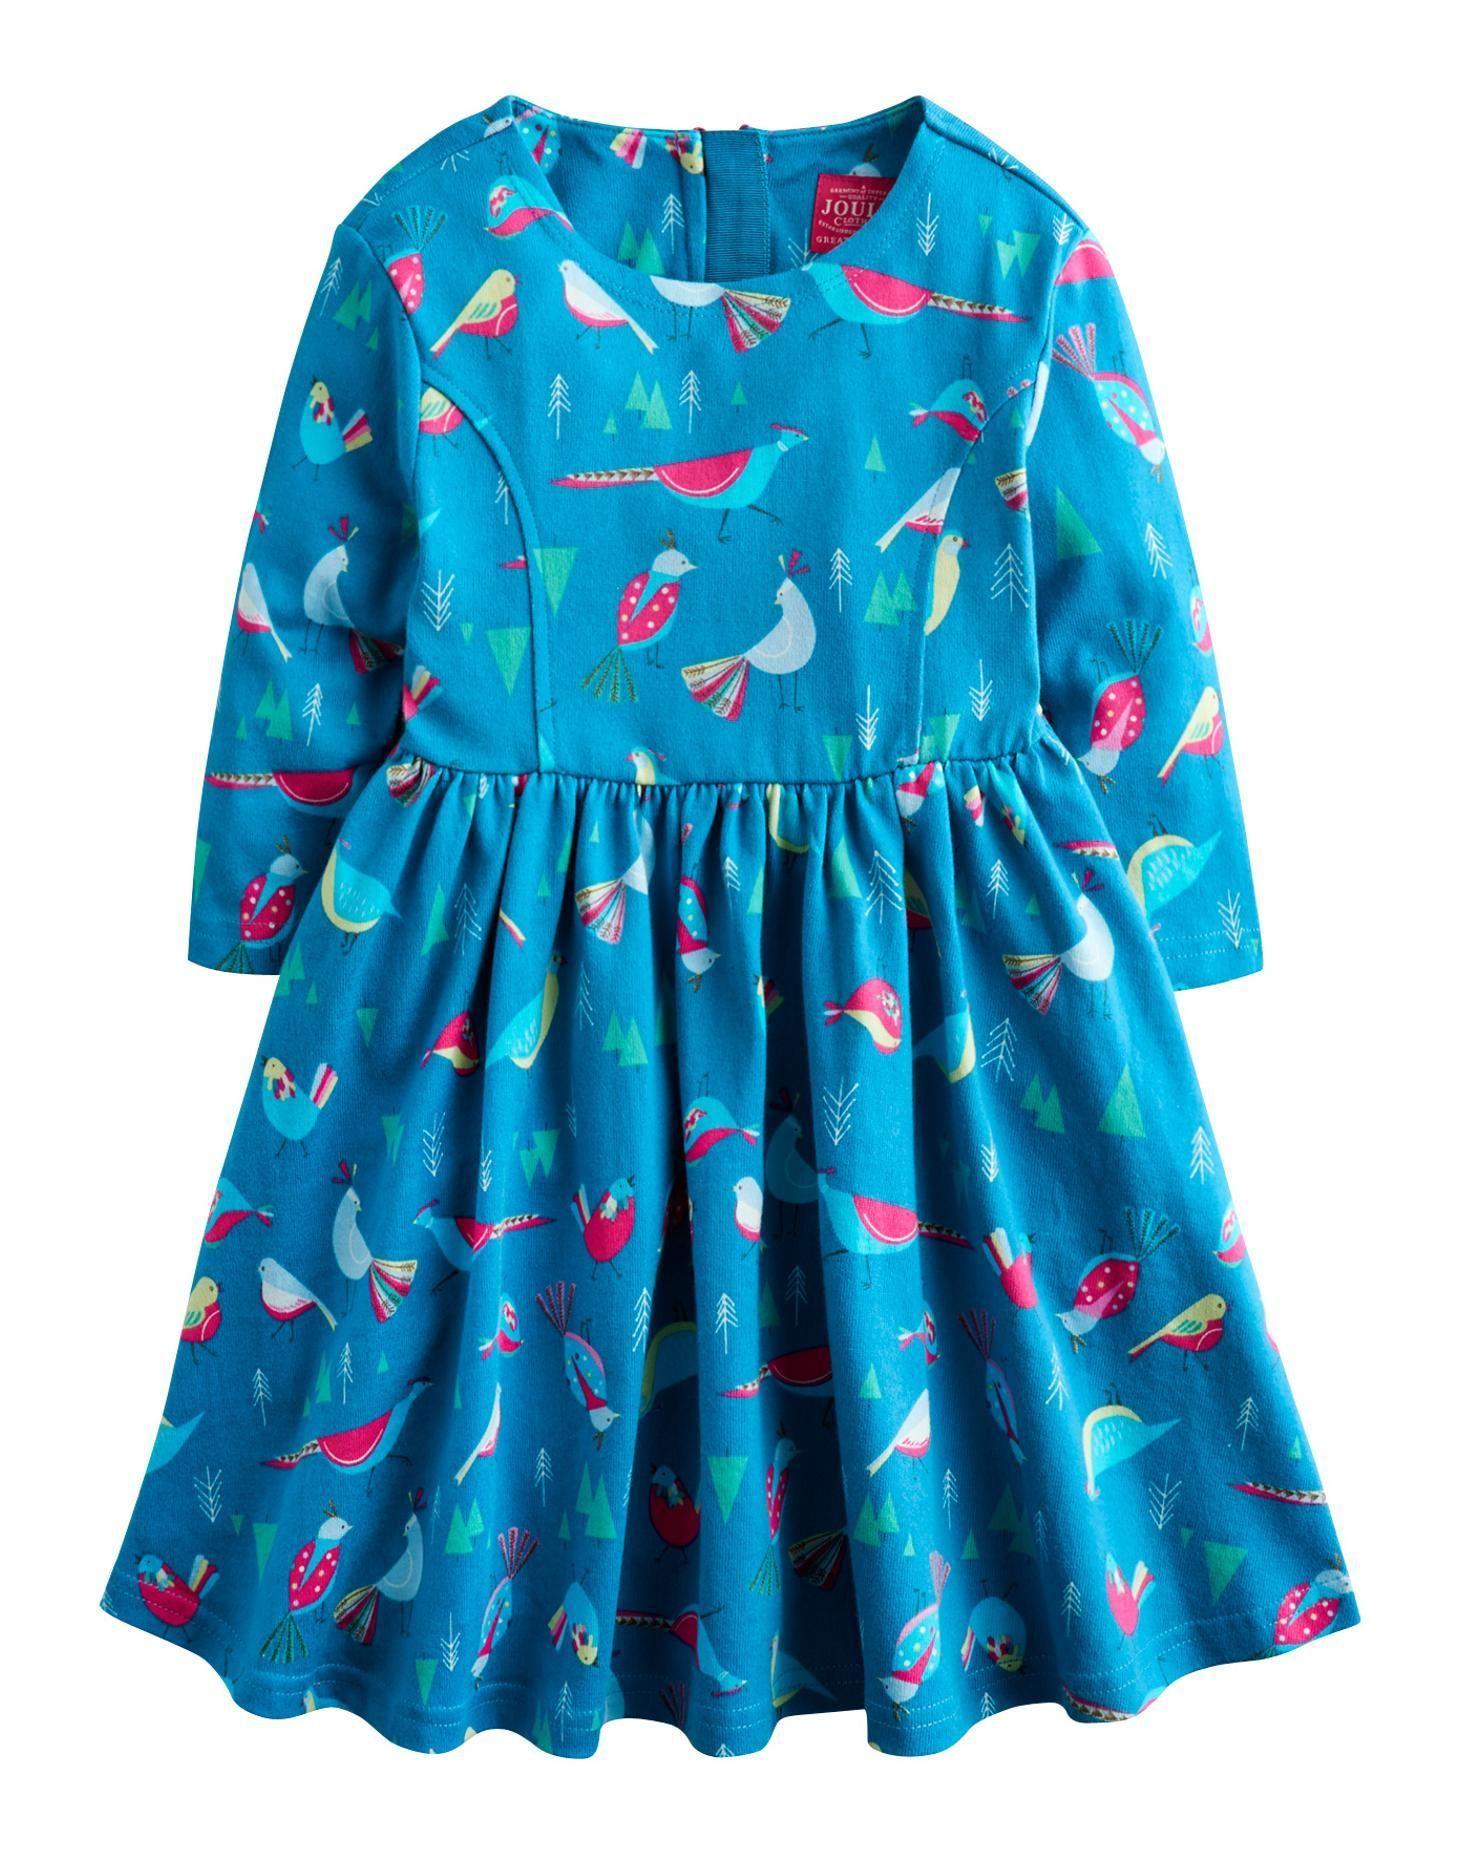 JNR MADLYN Girls Three Quarter Sleeve Dress